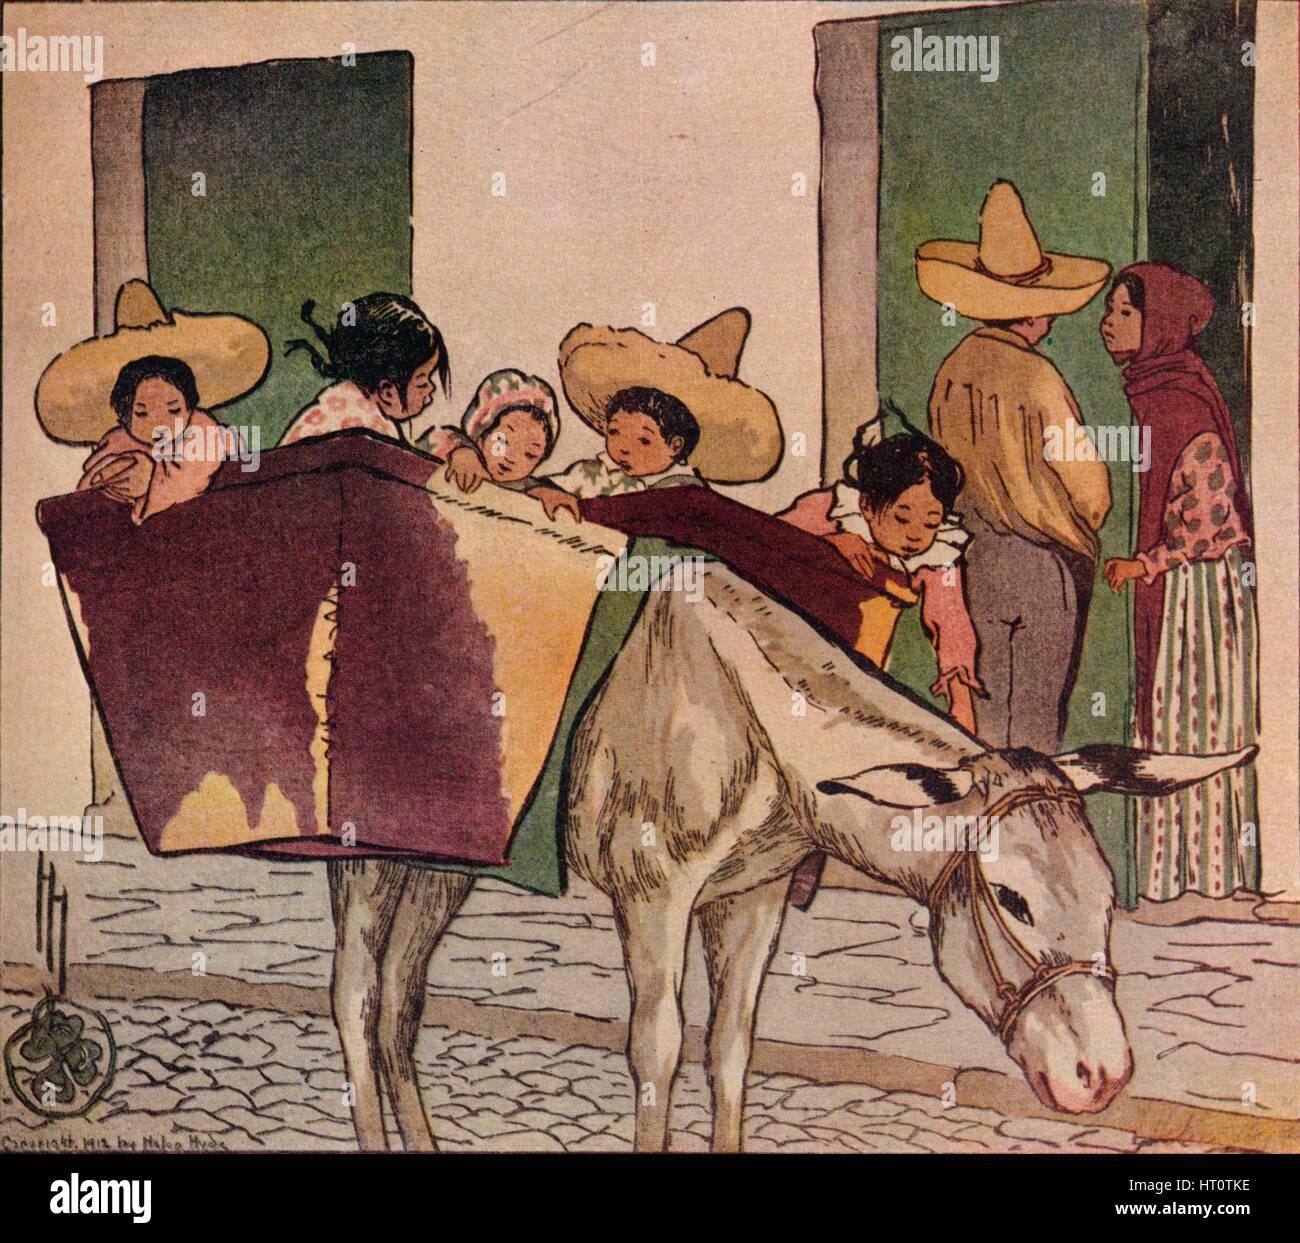 'An Interlude - The Breadman's Donkey', 1912. Artist: Helen Hyde. - Stock Image